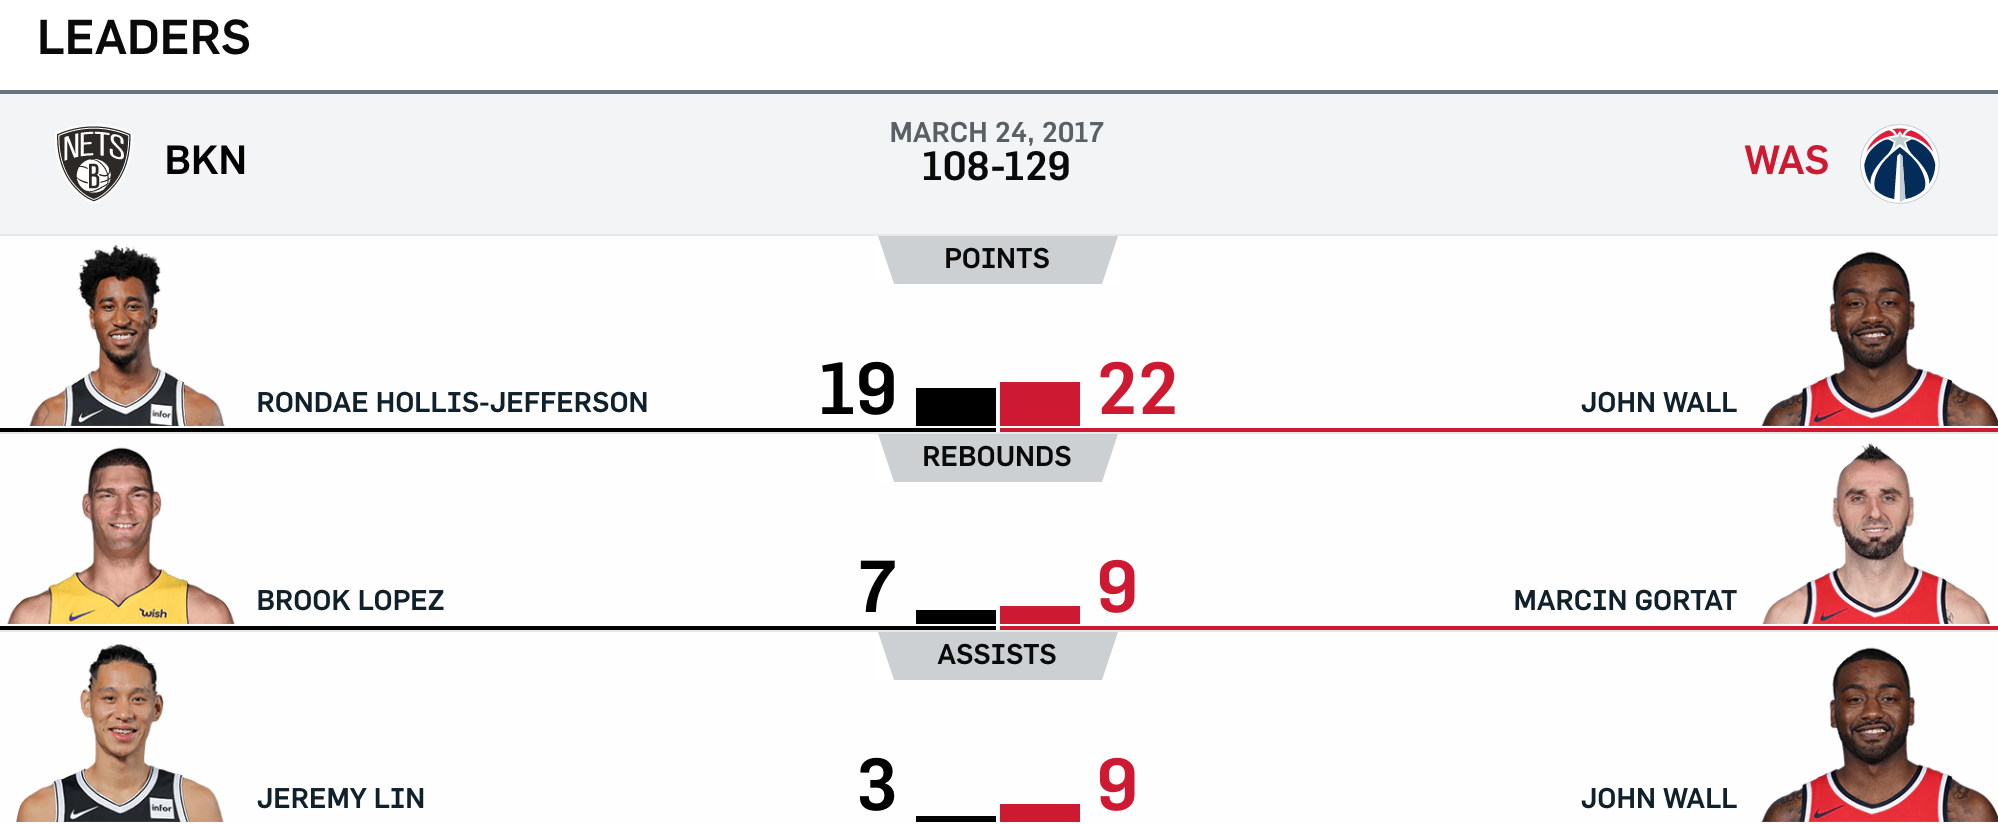 Nets vs Wizards 3-24-17 Leaders